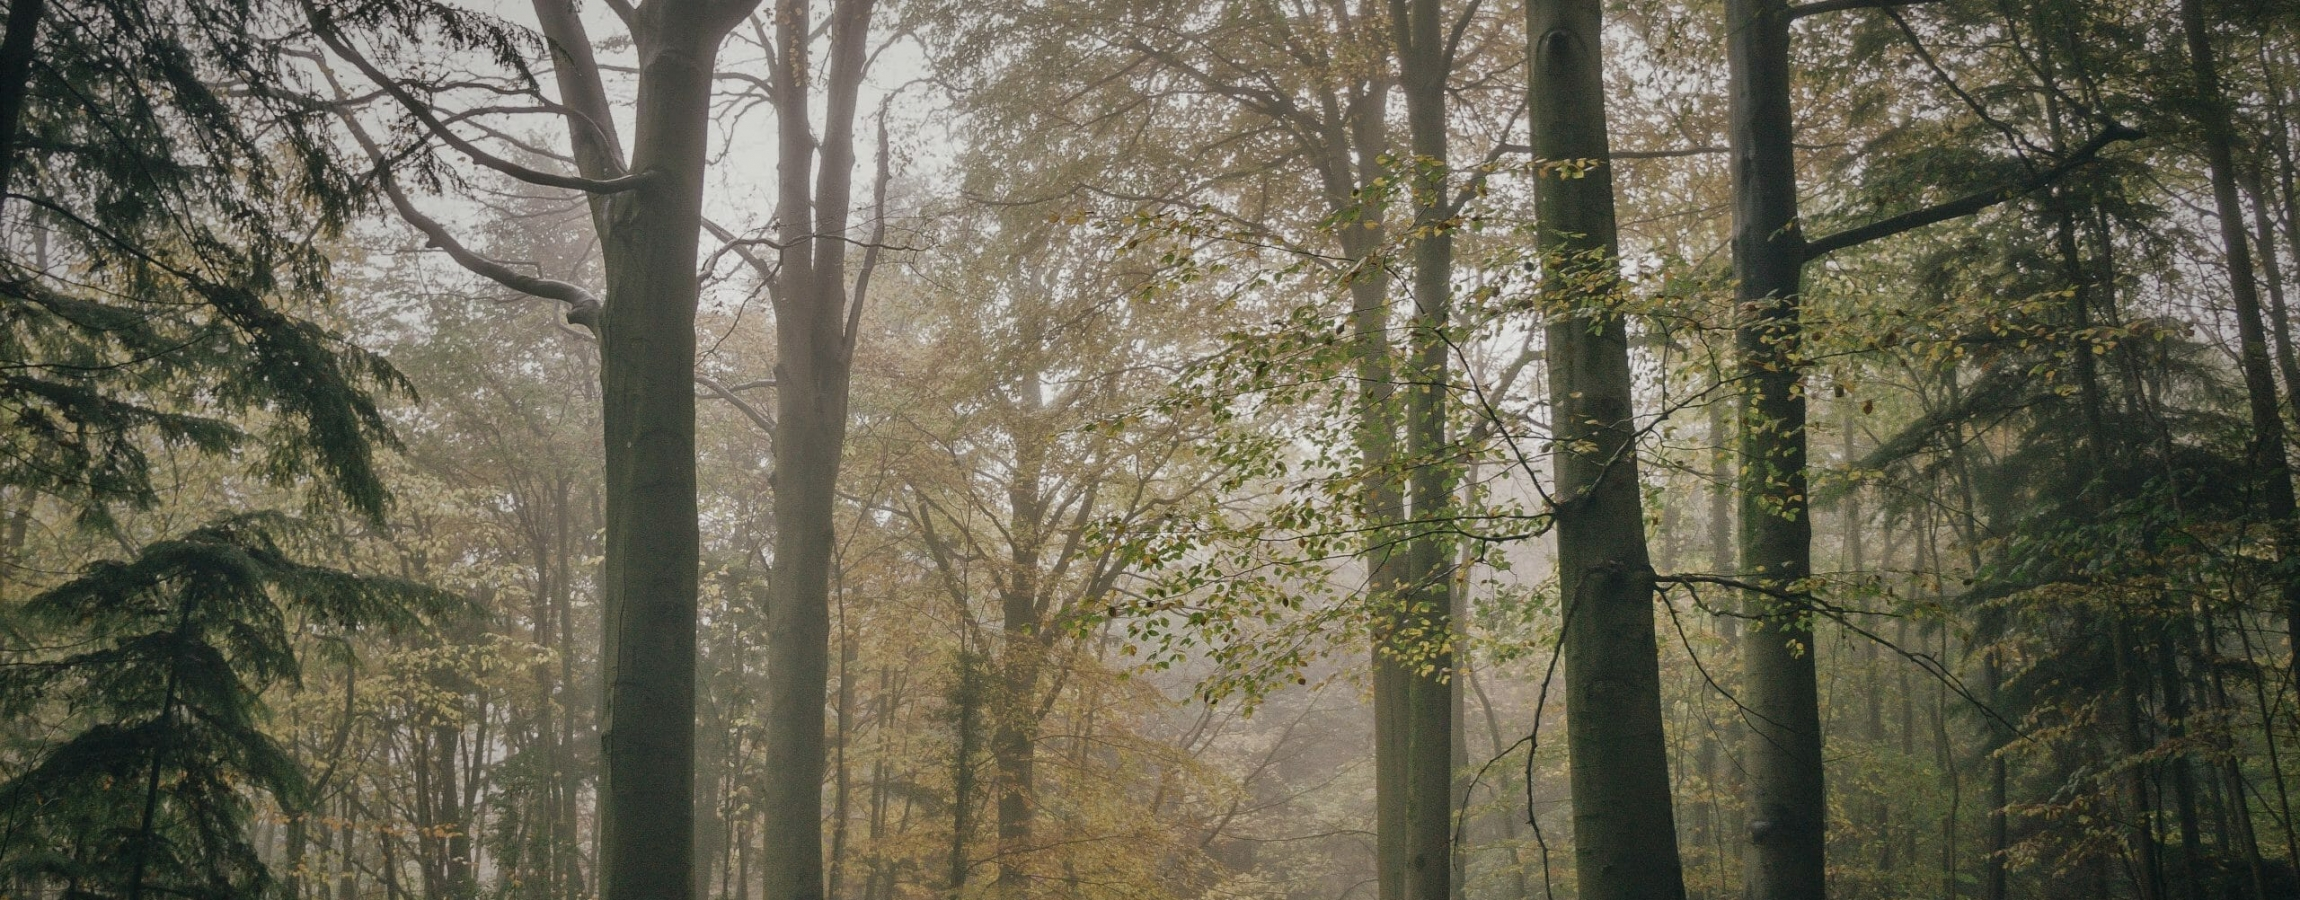 Darkened photo kriss-macdonald-YUTAkQ0ufYc-unsplash